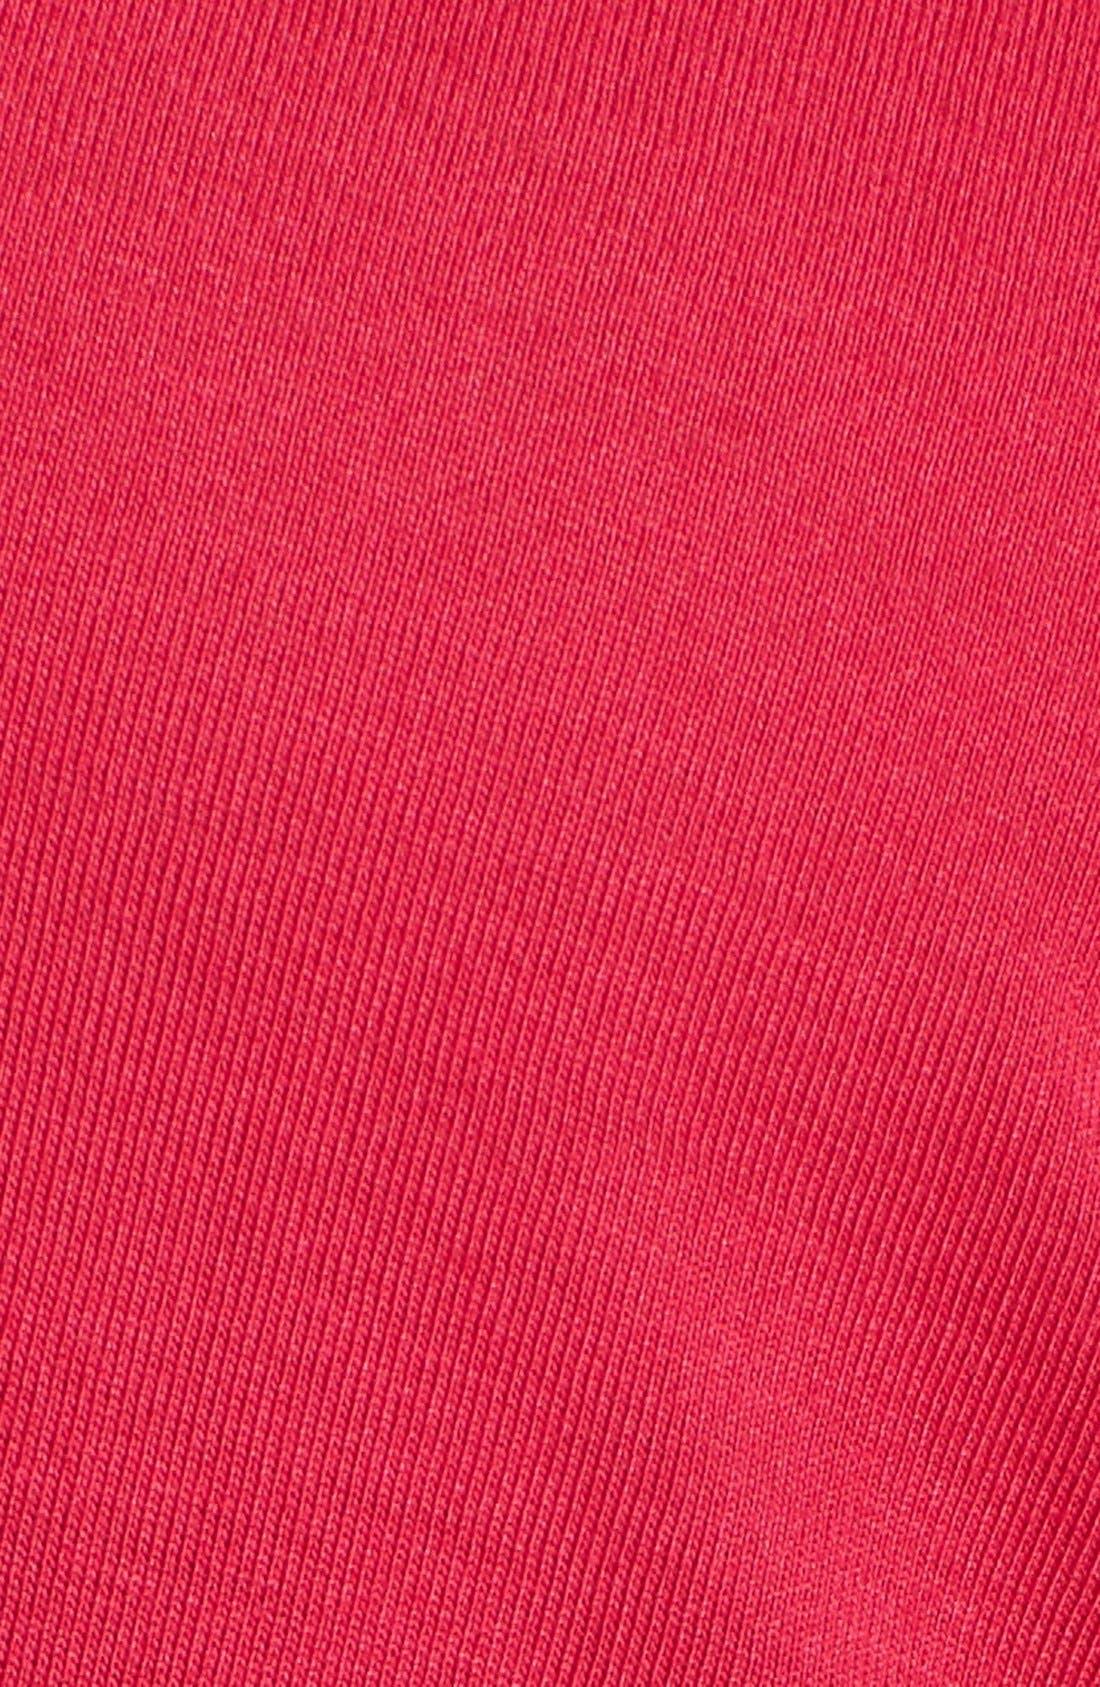 Alternate Image 5  - Sejour Handkerchief Hem Tunic Top (Plus Size)